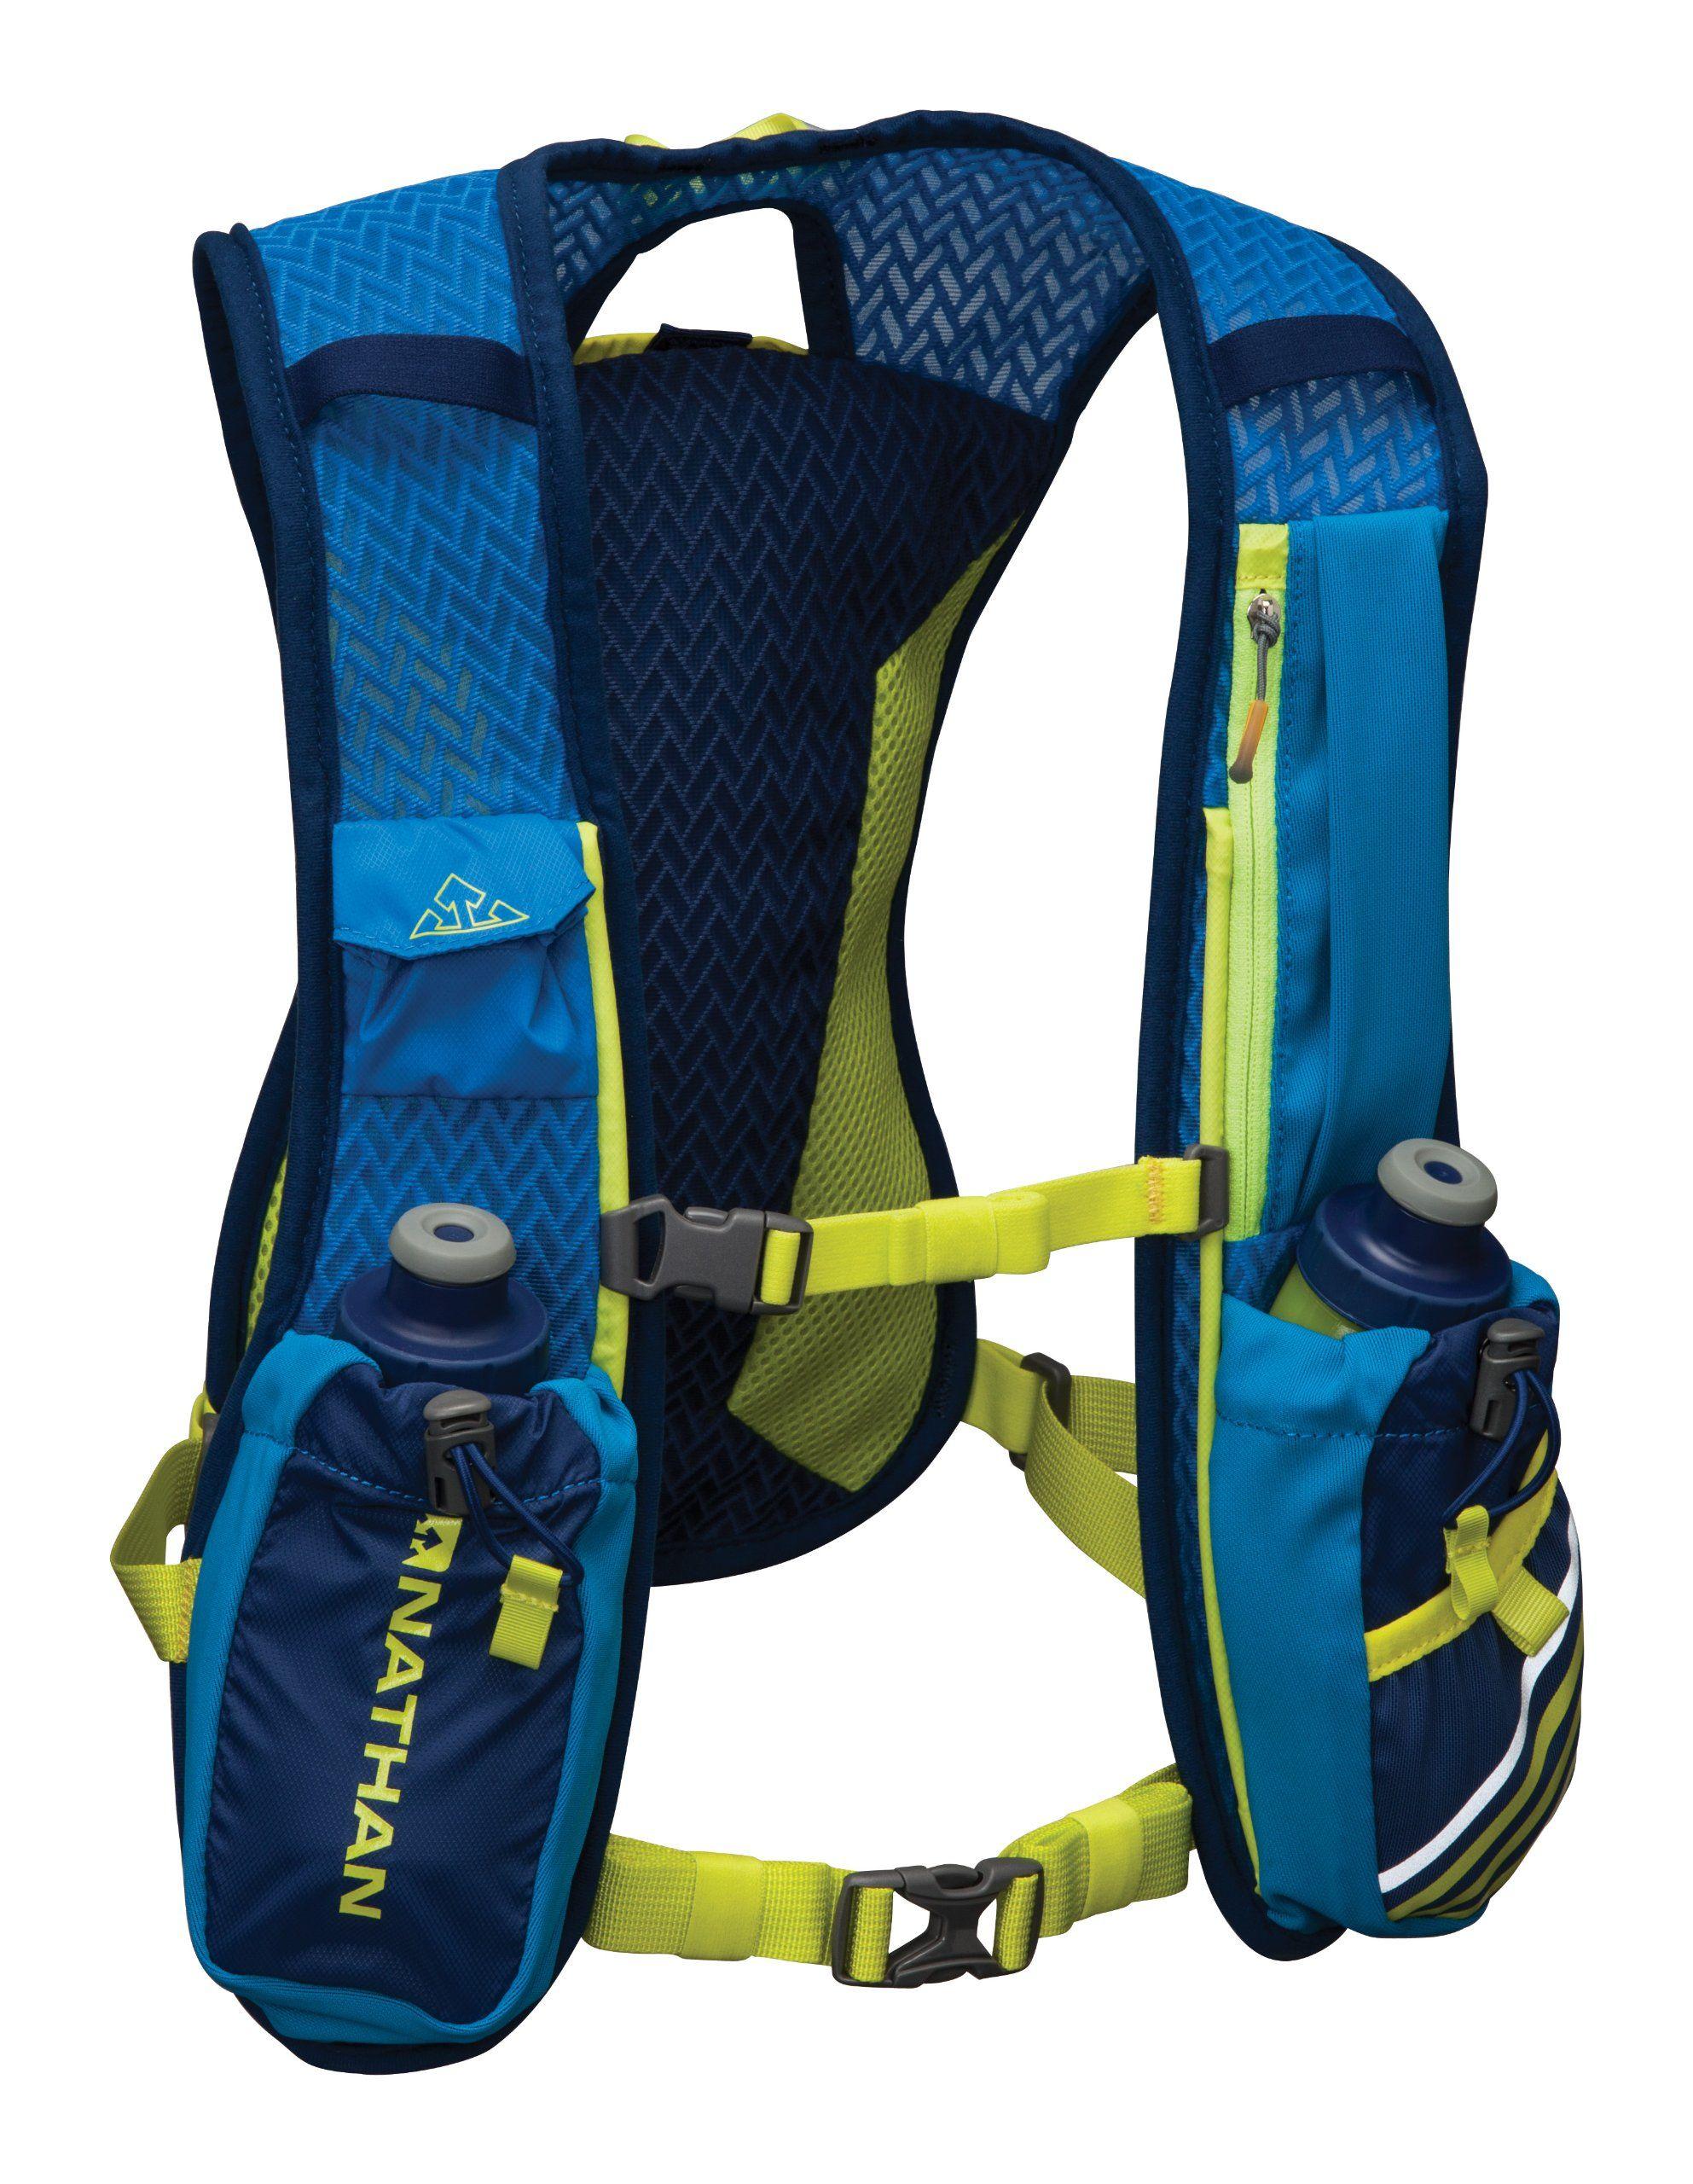 Amazoncom Nathan Firecatcher Hydration Vest Blue One Fueltbelt Neon Size Running Packs Sports Outdoors